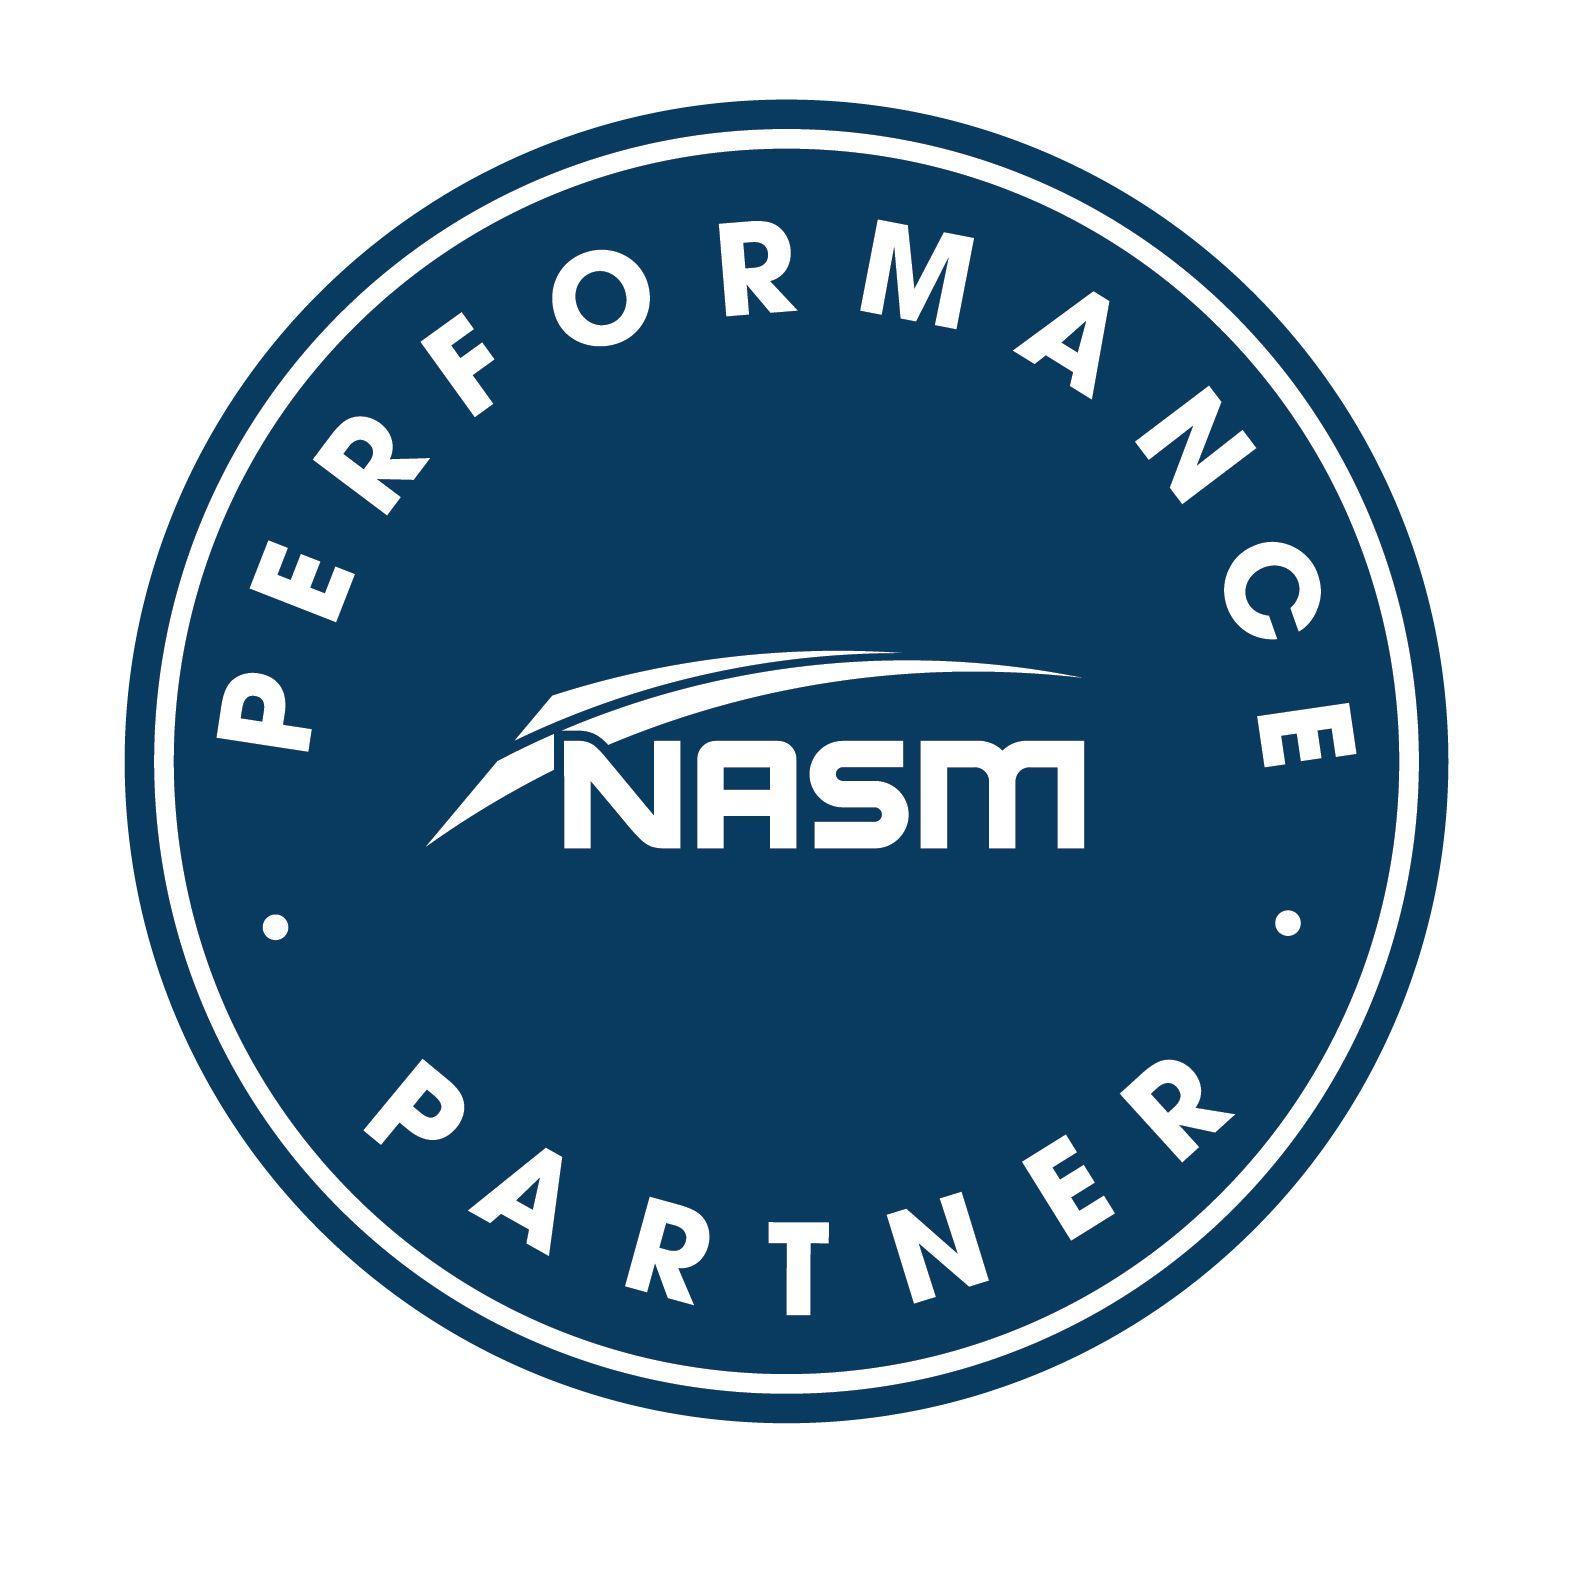 NASM Partner Seal